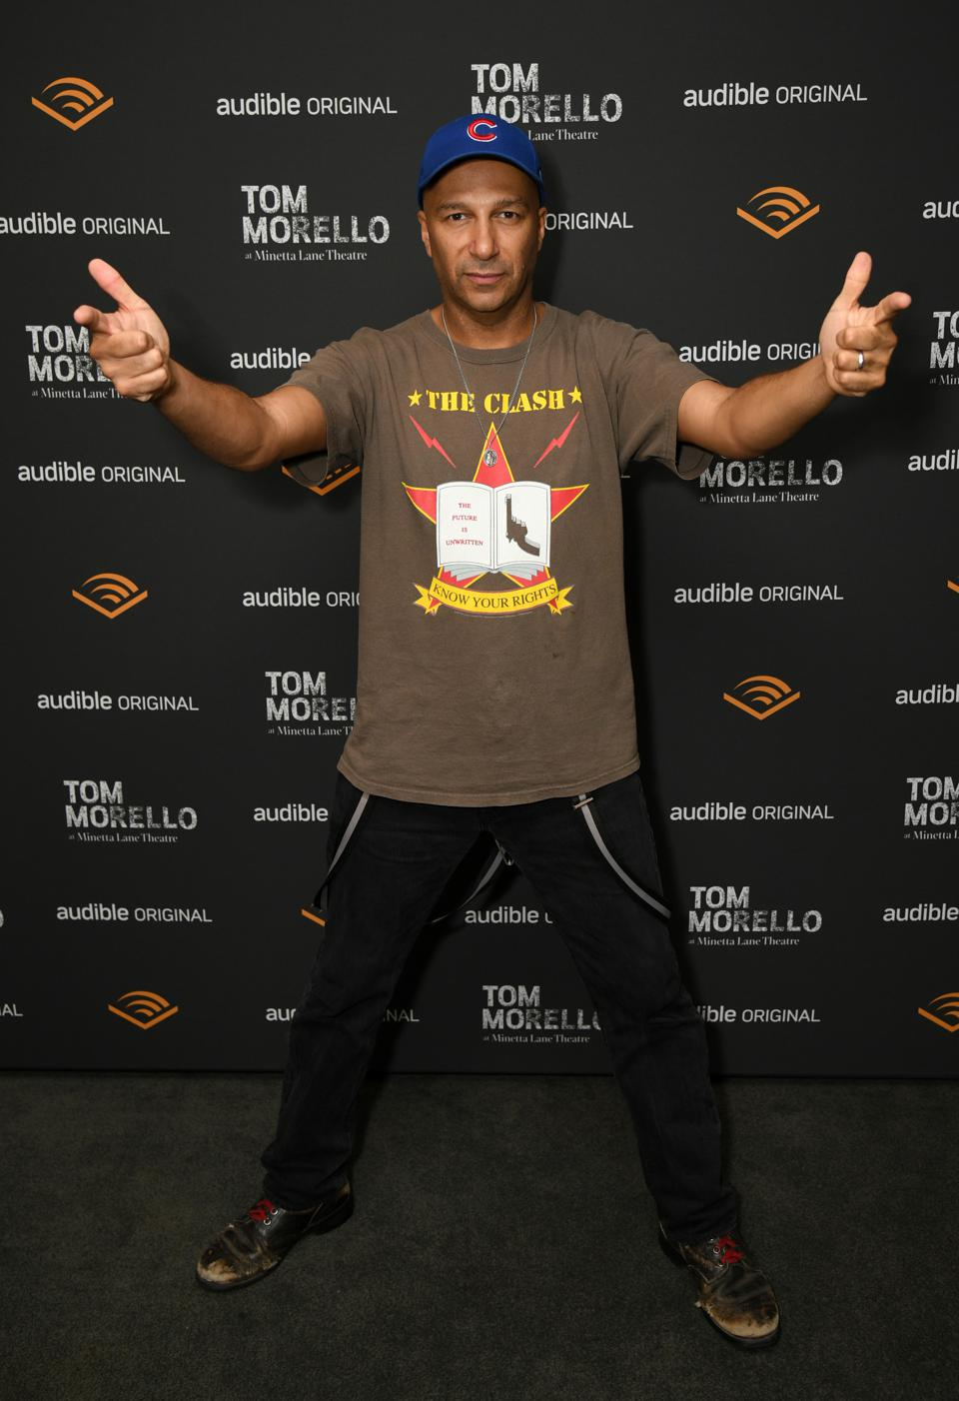 Audible Celebrates Tom Morello At Minetta Lane Theatre In NYC